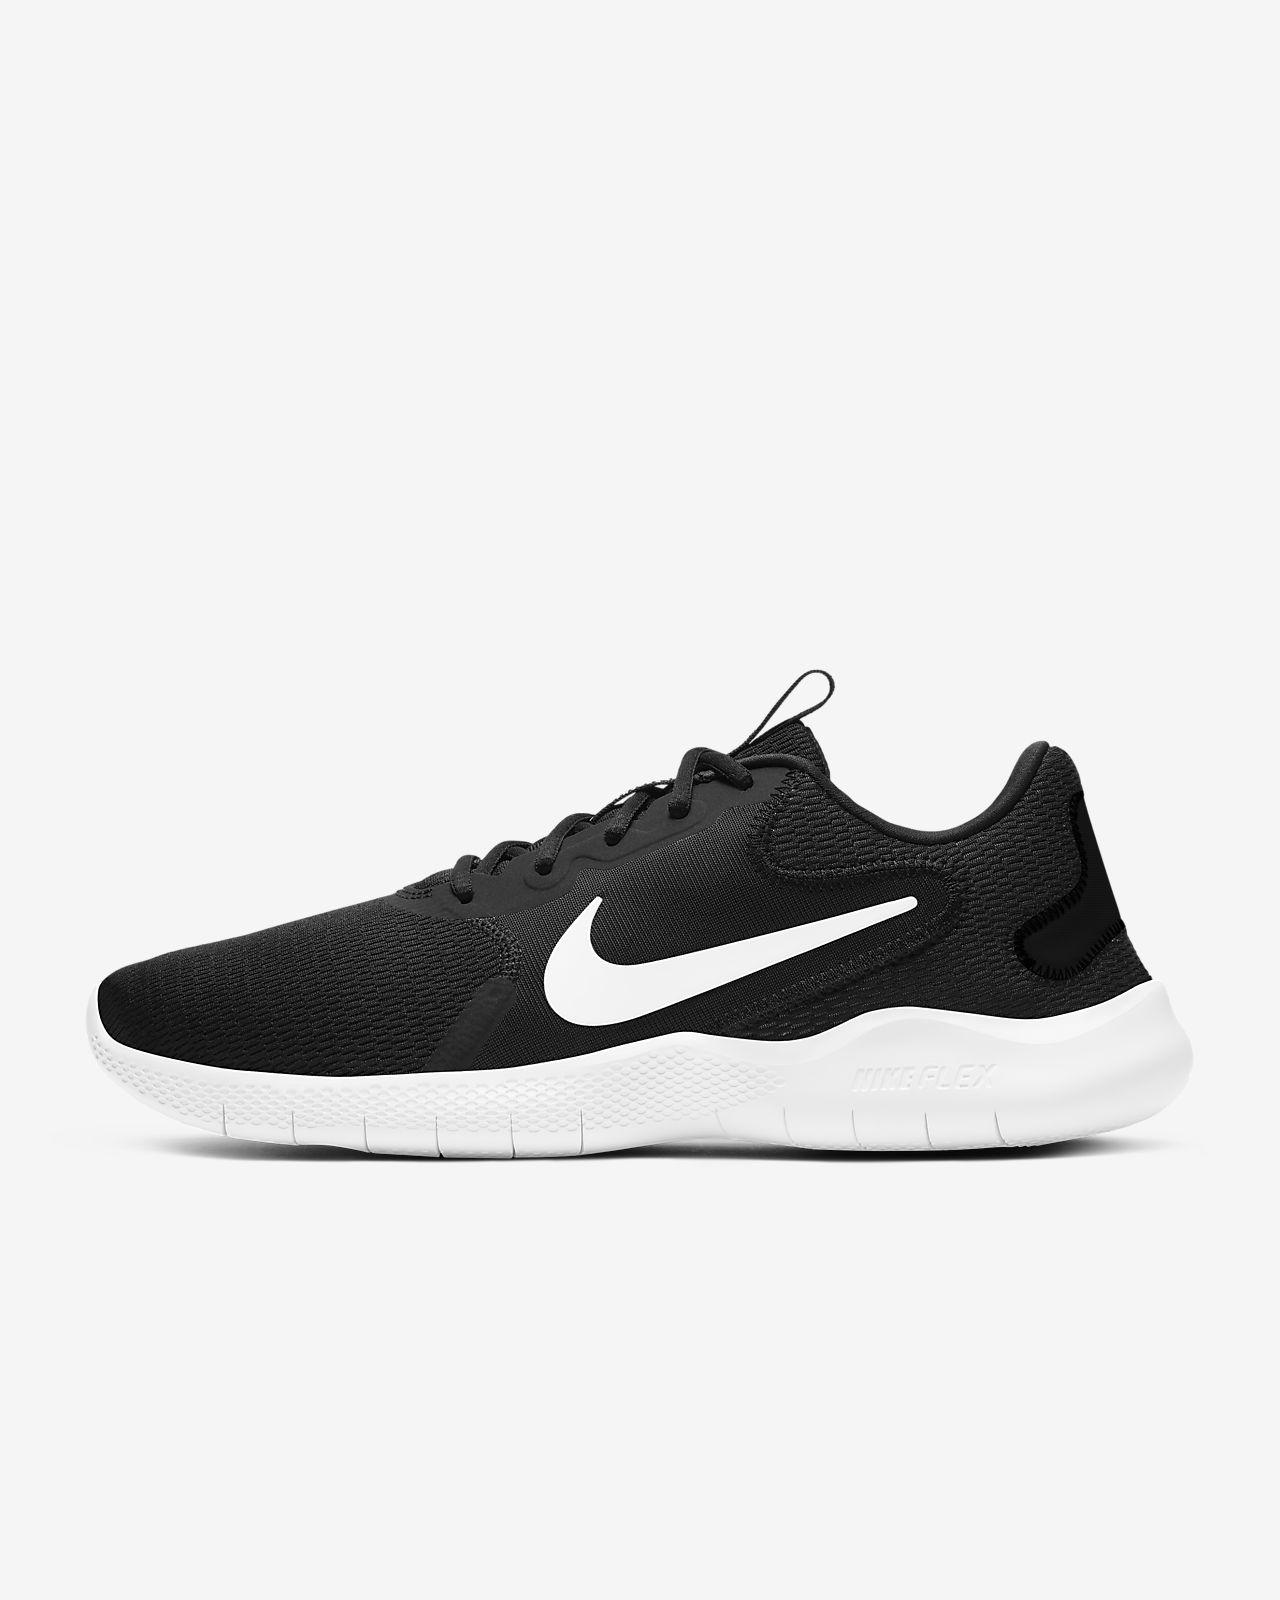 NIKE Official]Nike Flex Experience Run 9 Men's Running Shoe.Online